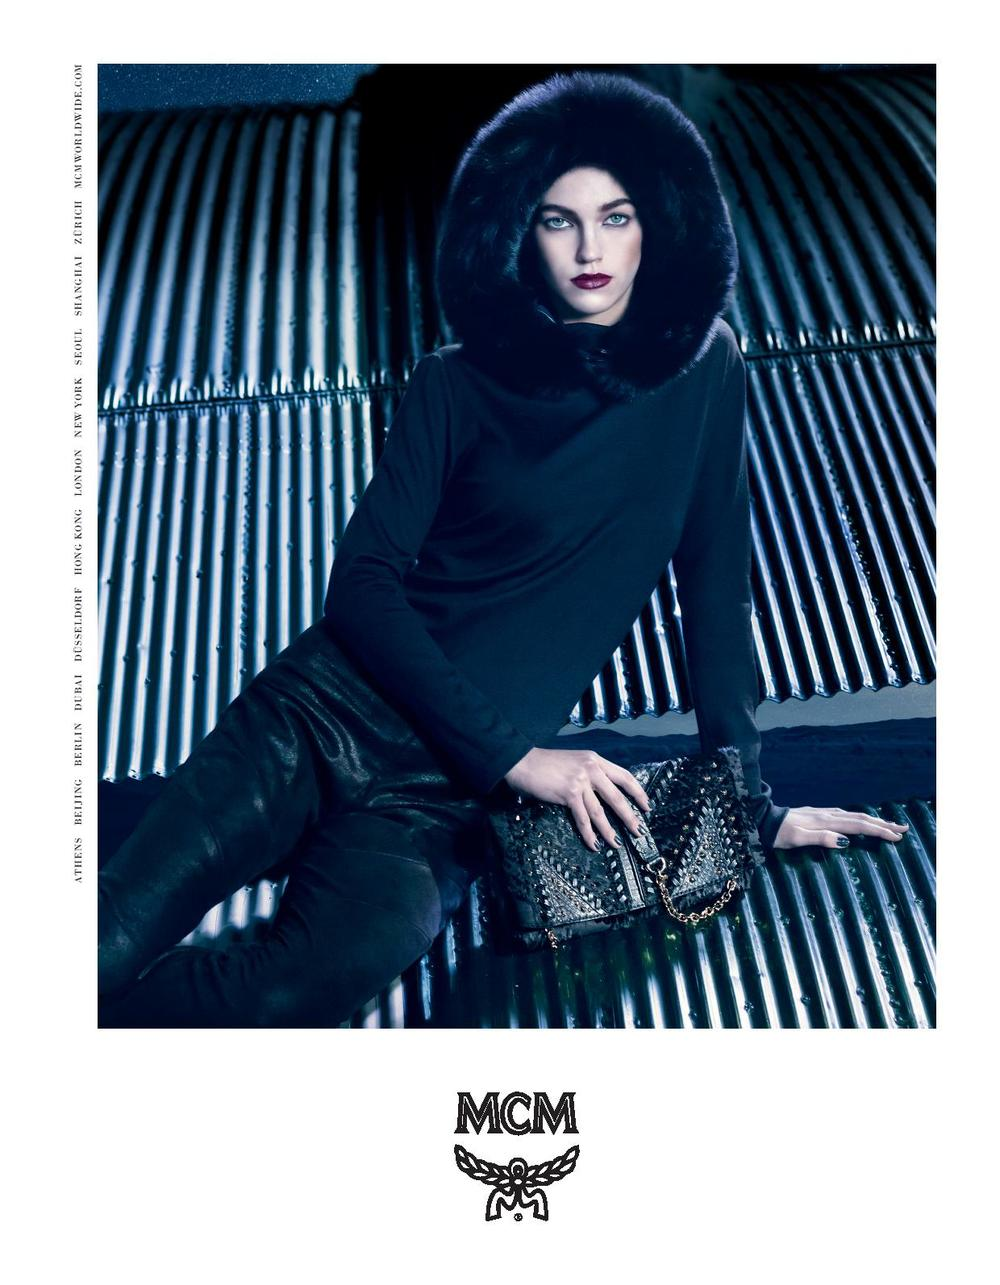 MCM FW13 Print Ads_210x270-page-004.jpg